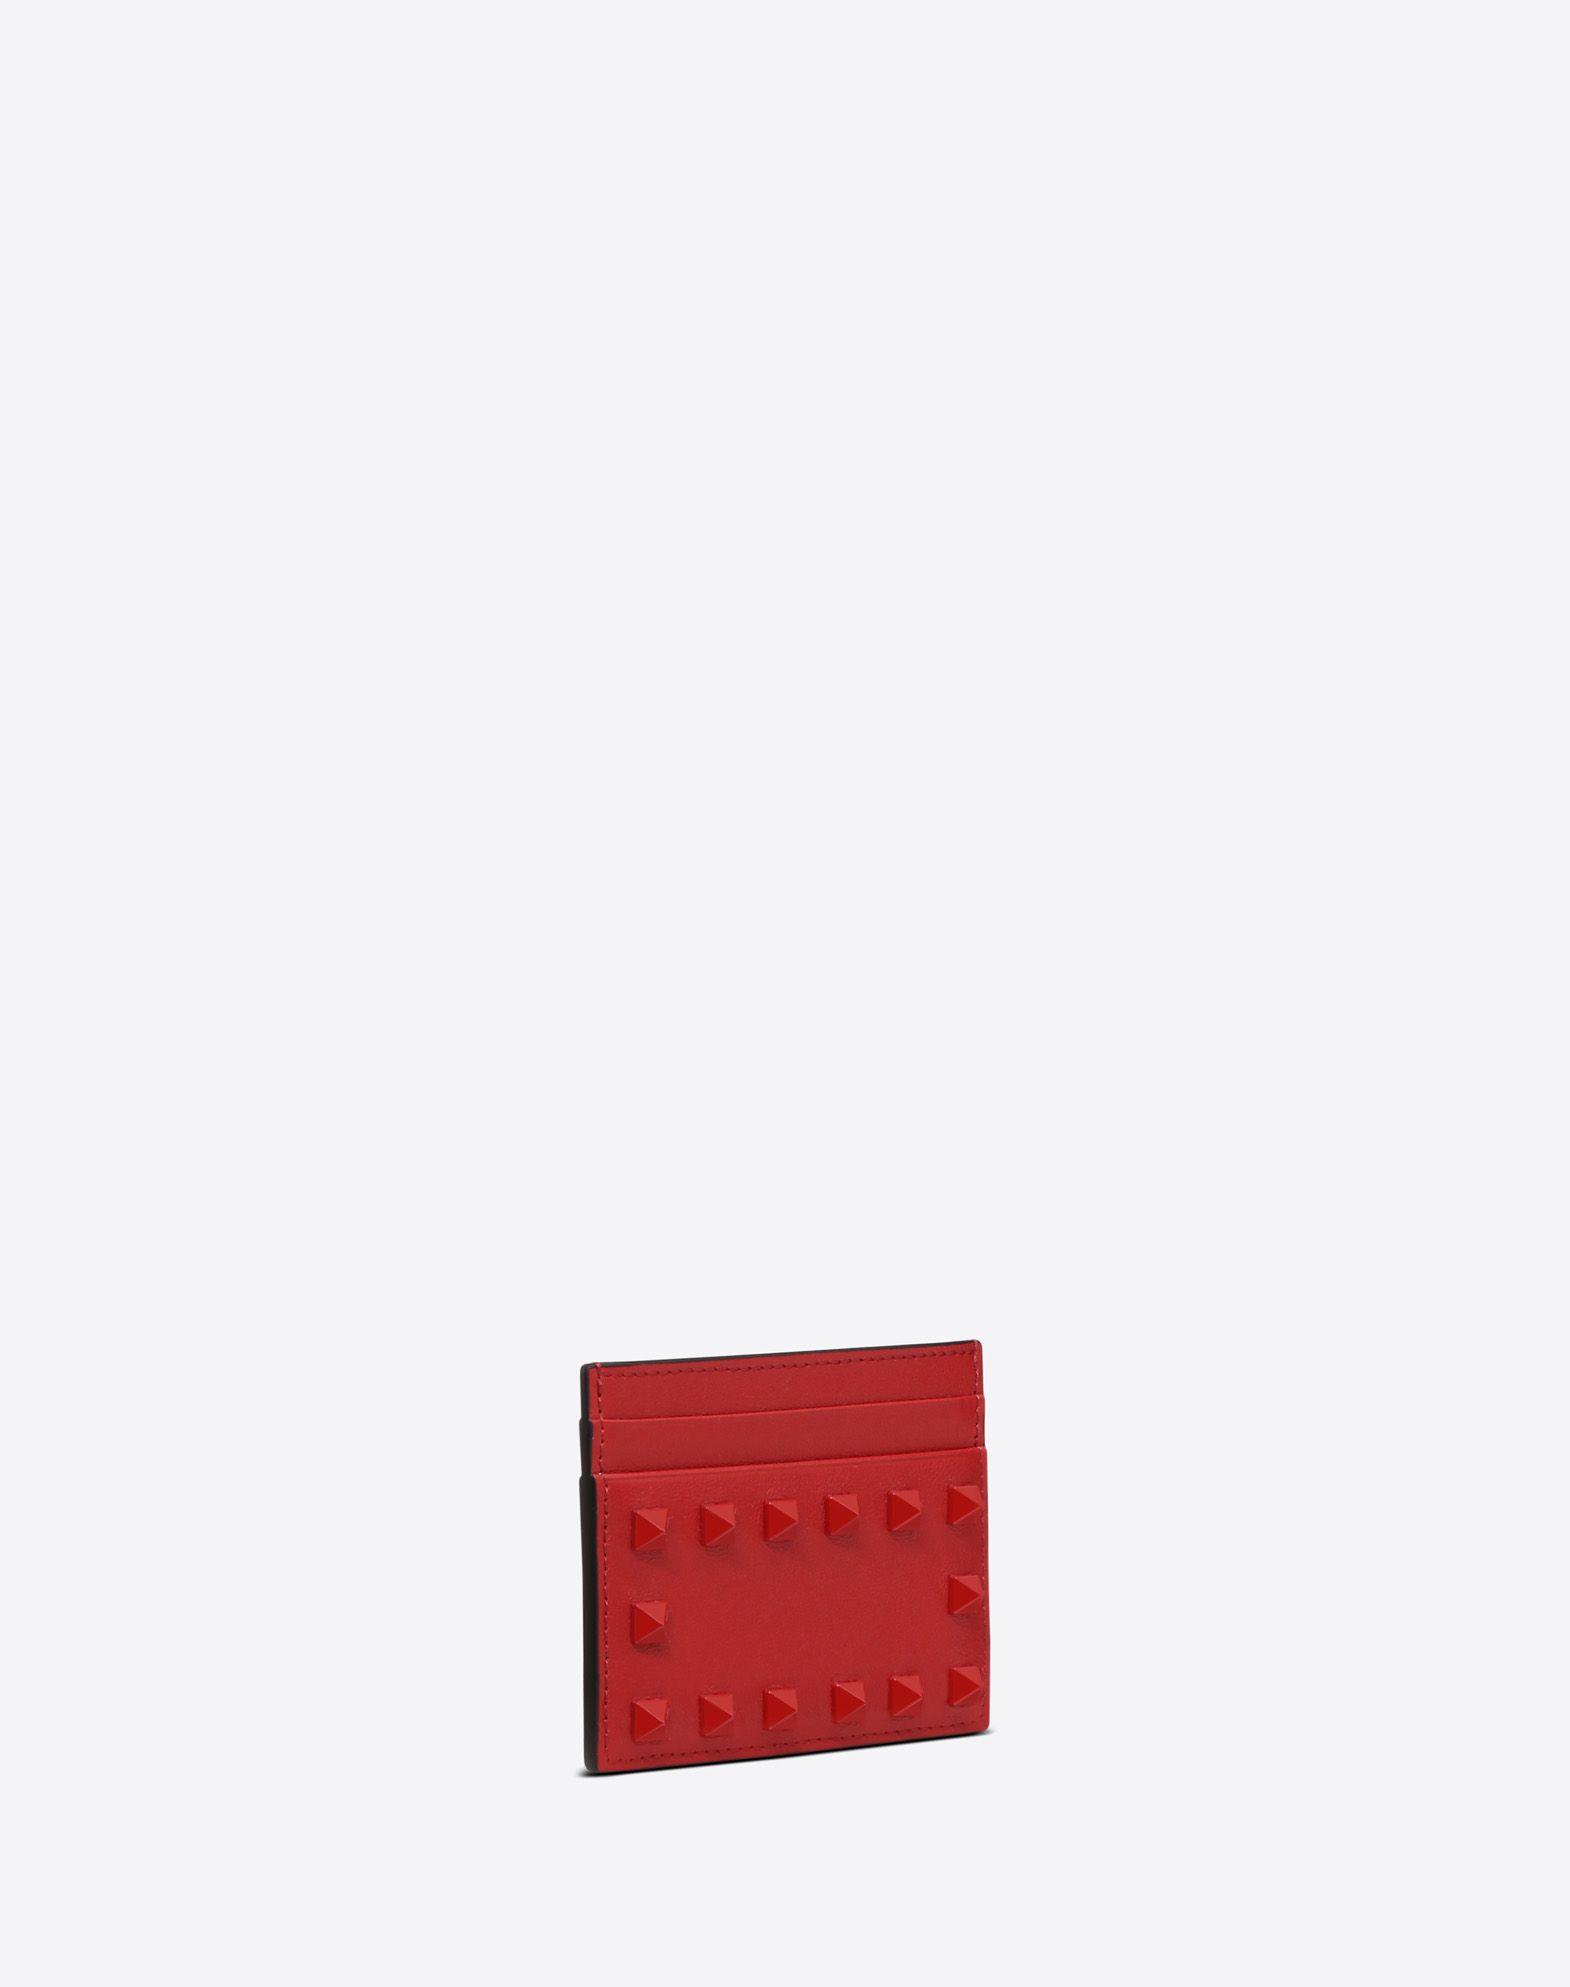 VALENTINO GARAVANI Rockstud Cardholder COIN PURSES & CARD CASES D r